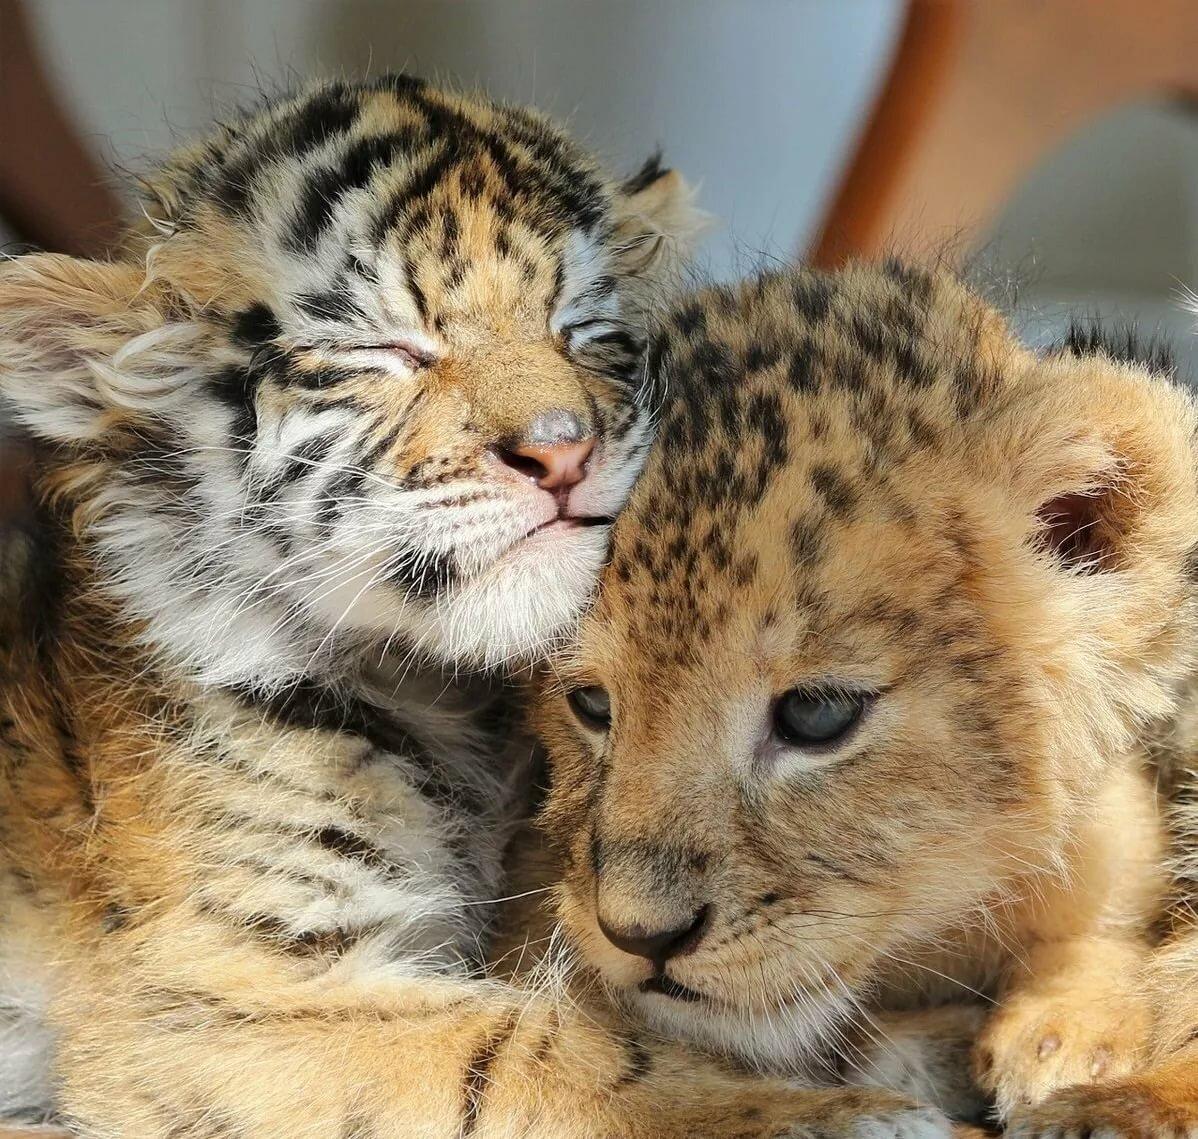 Картинки с тигрятами и львятами, тему ждем